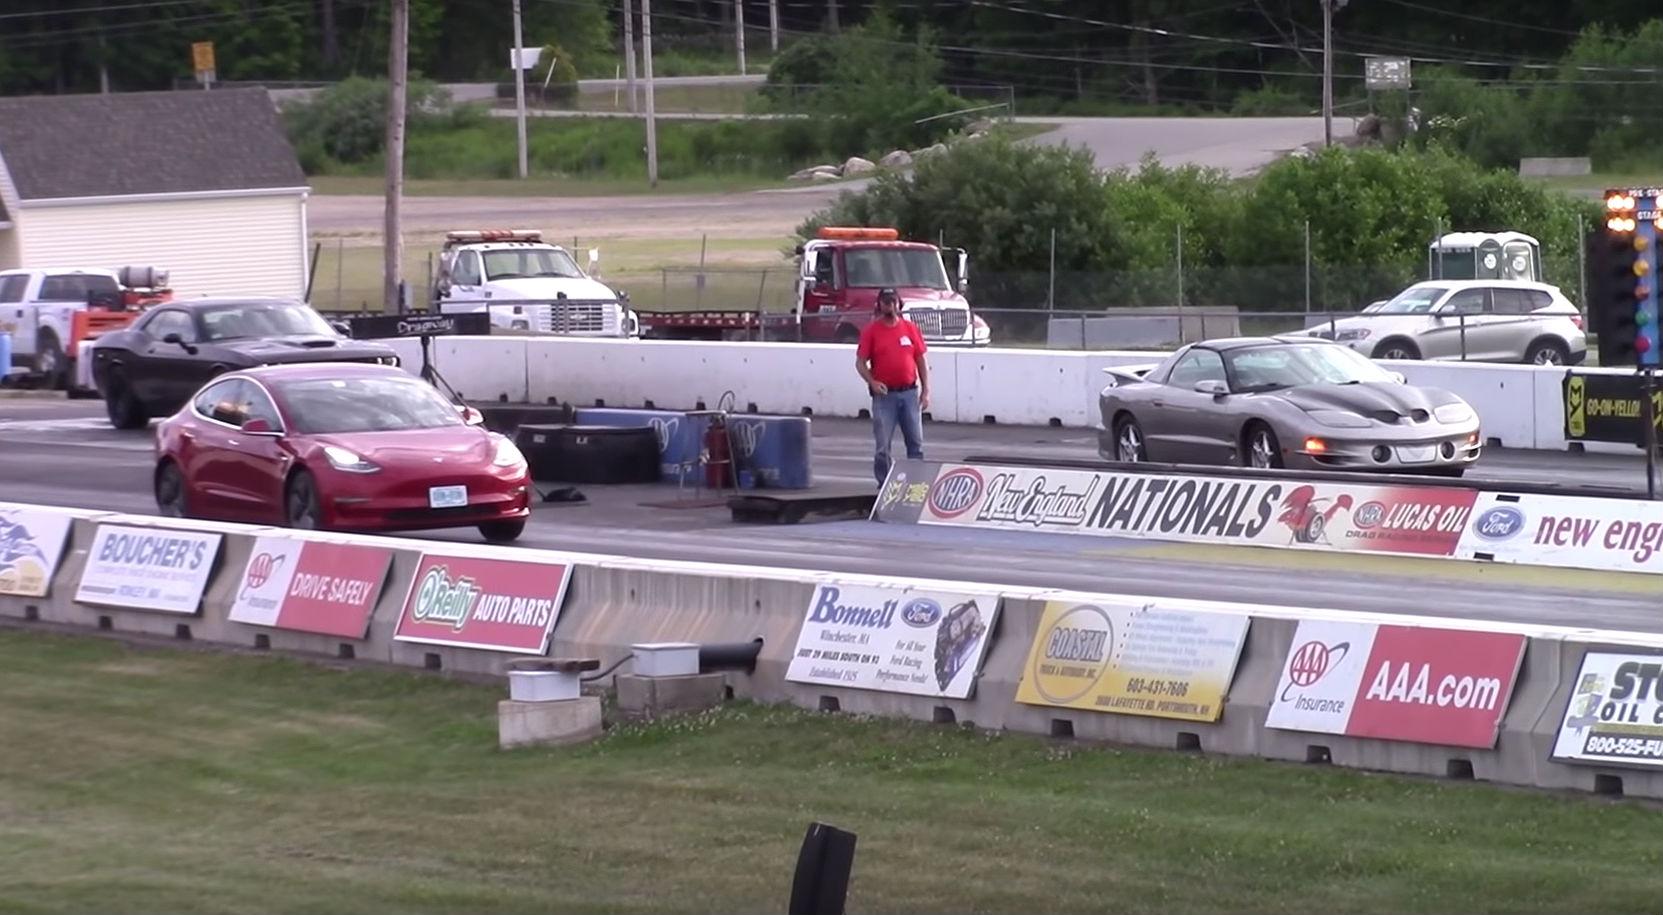 Tesla Model 3 Drag Races Pontiac Firebird Trans Am In Tense 1 4 Mile 1998 Specs Battle